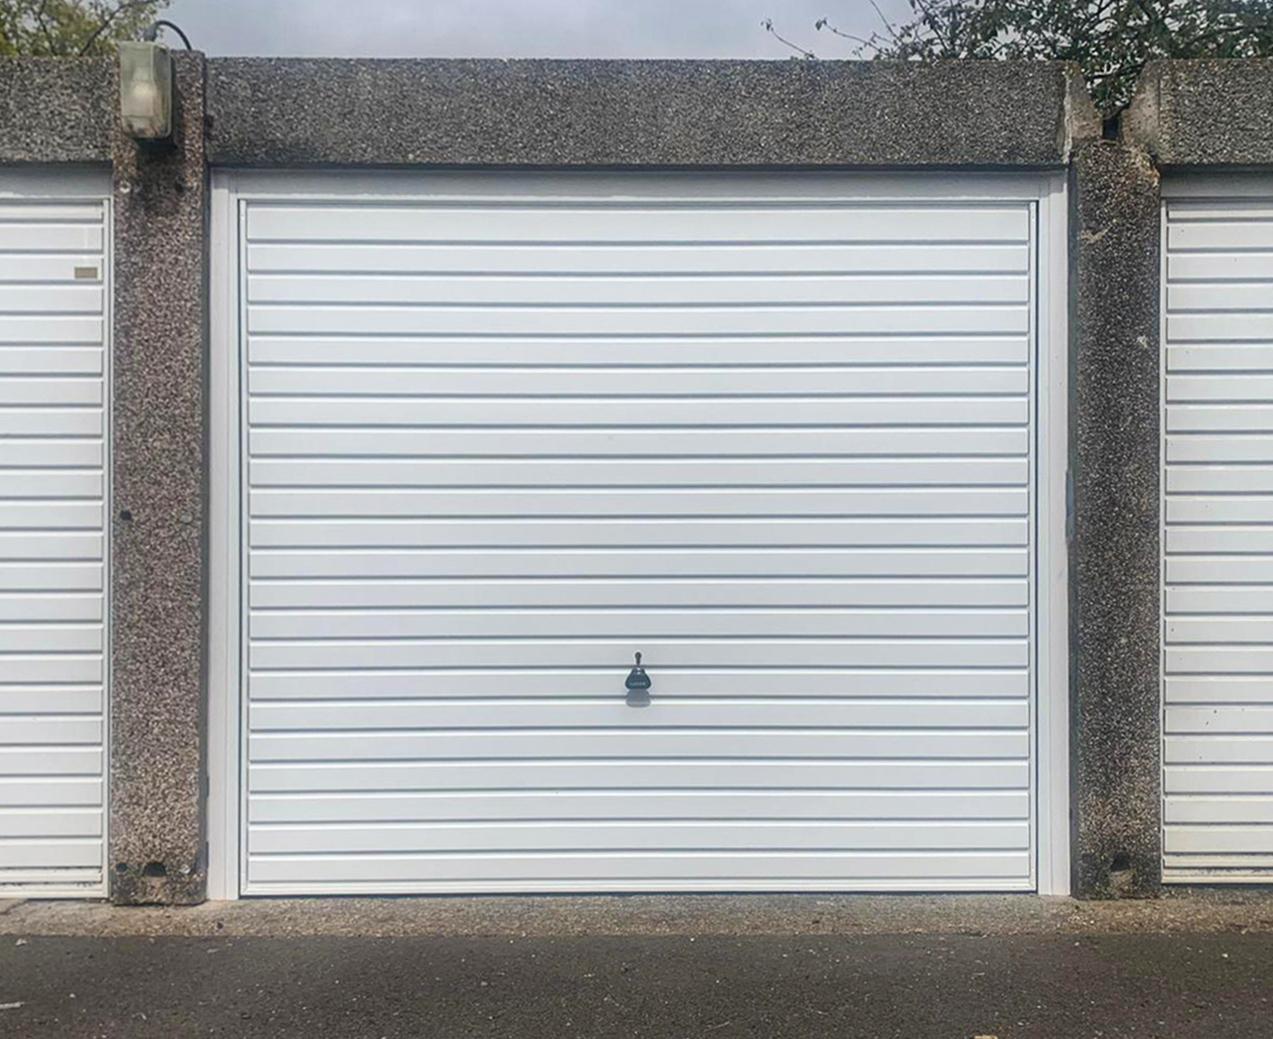 This Garador Steel Up & Over Garage Door Finished in White